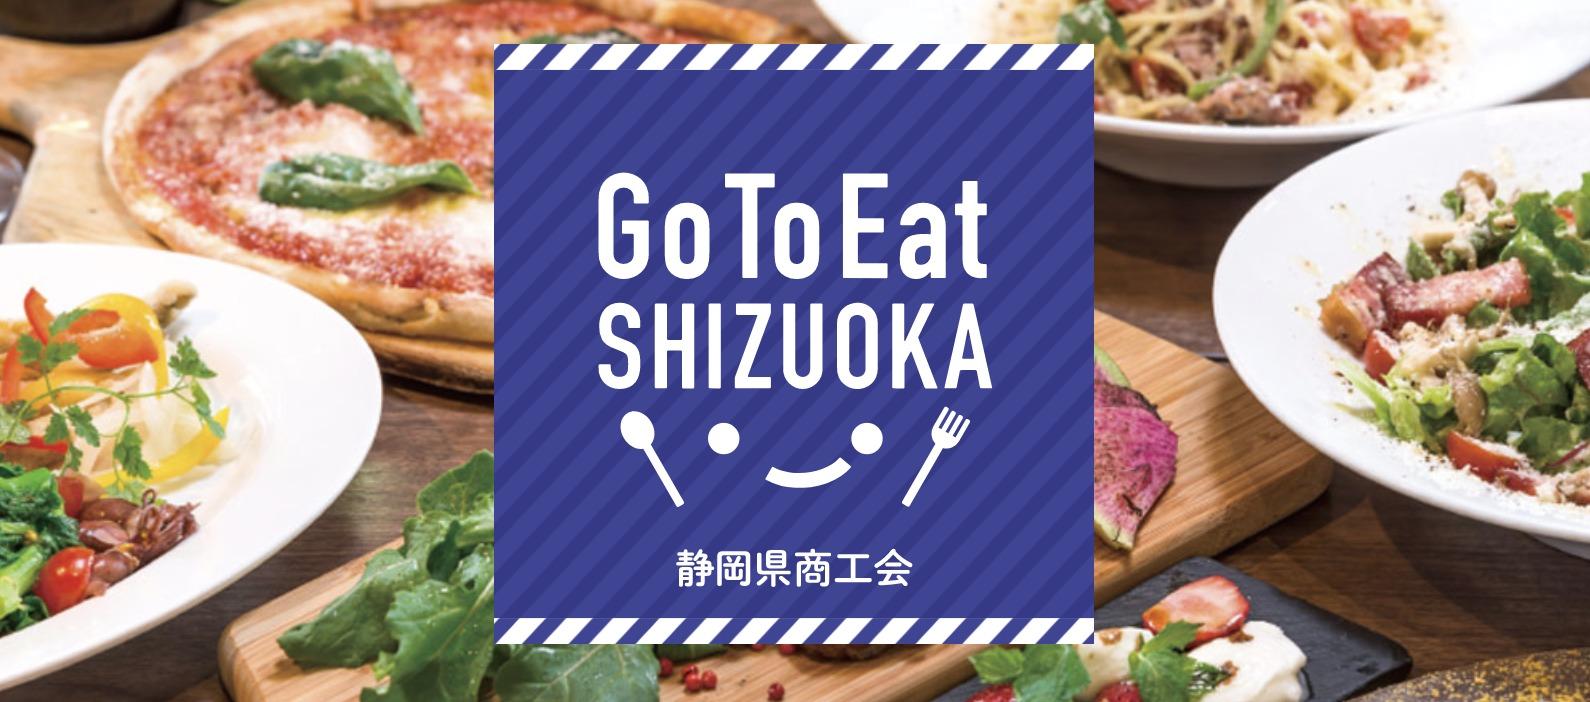 go to eat shizuoka